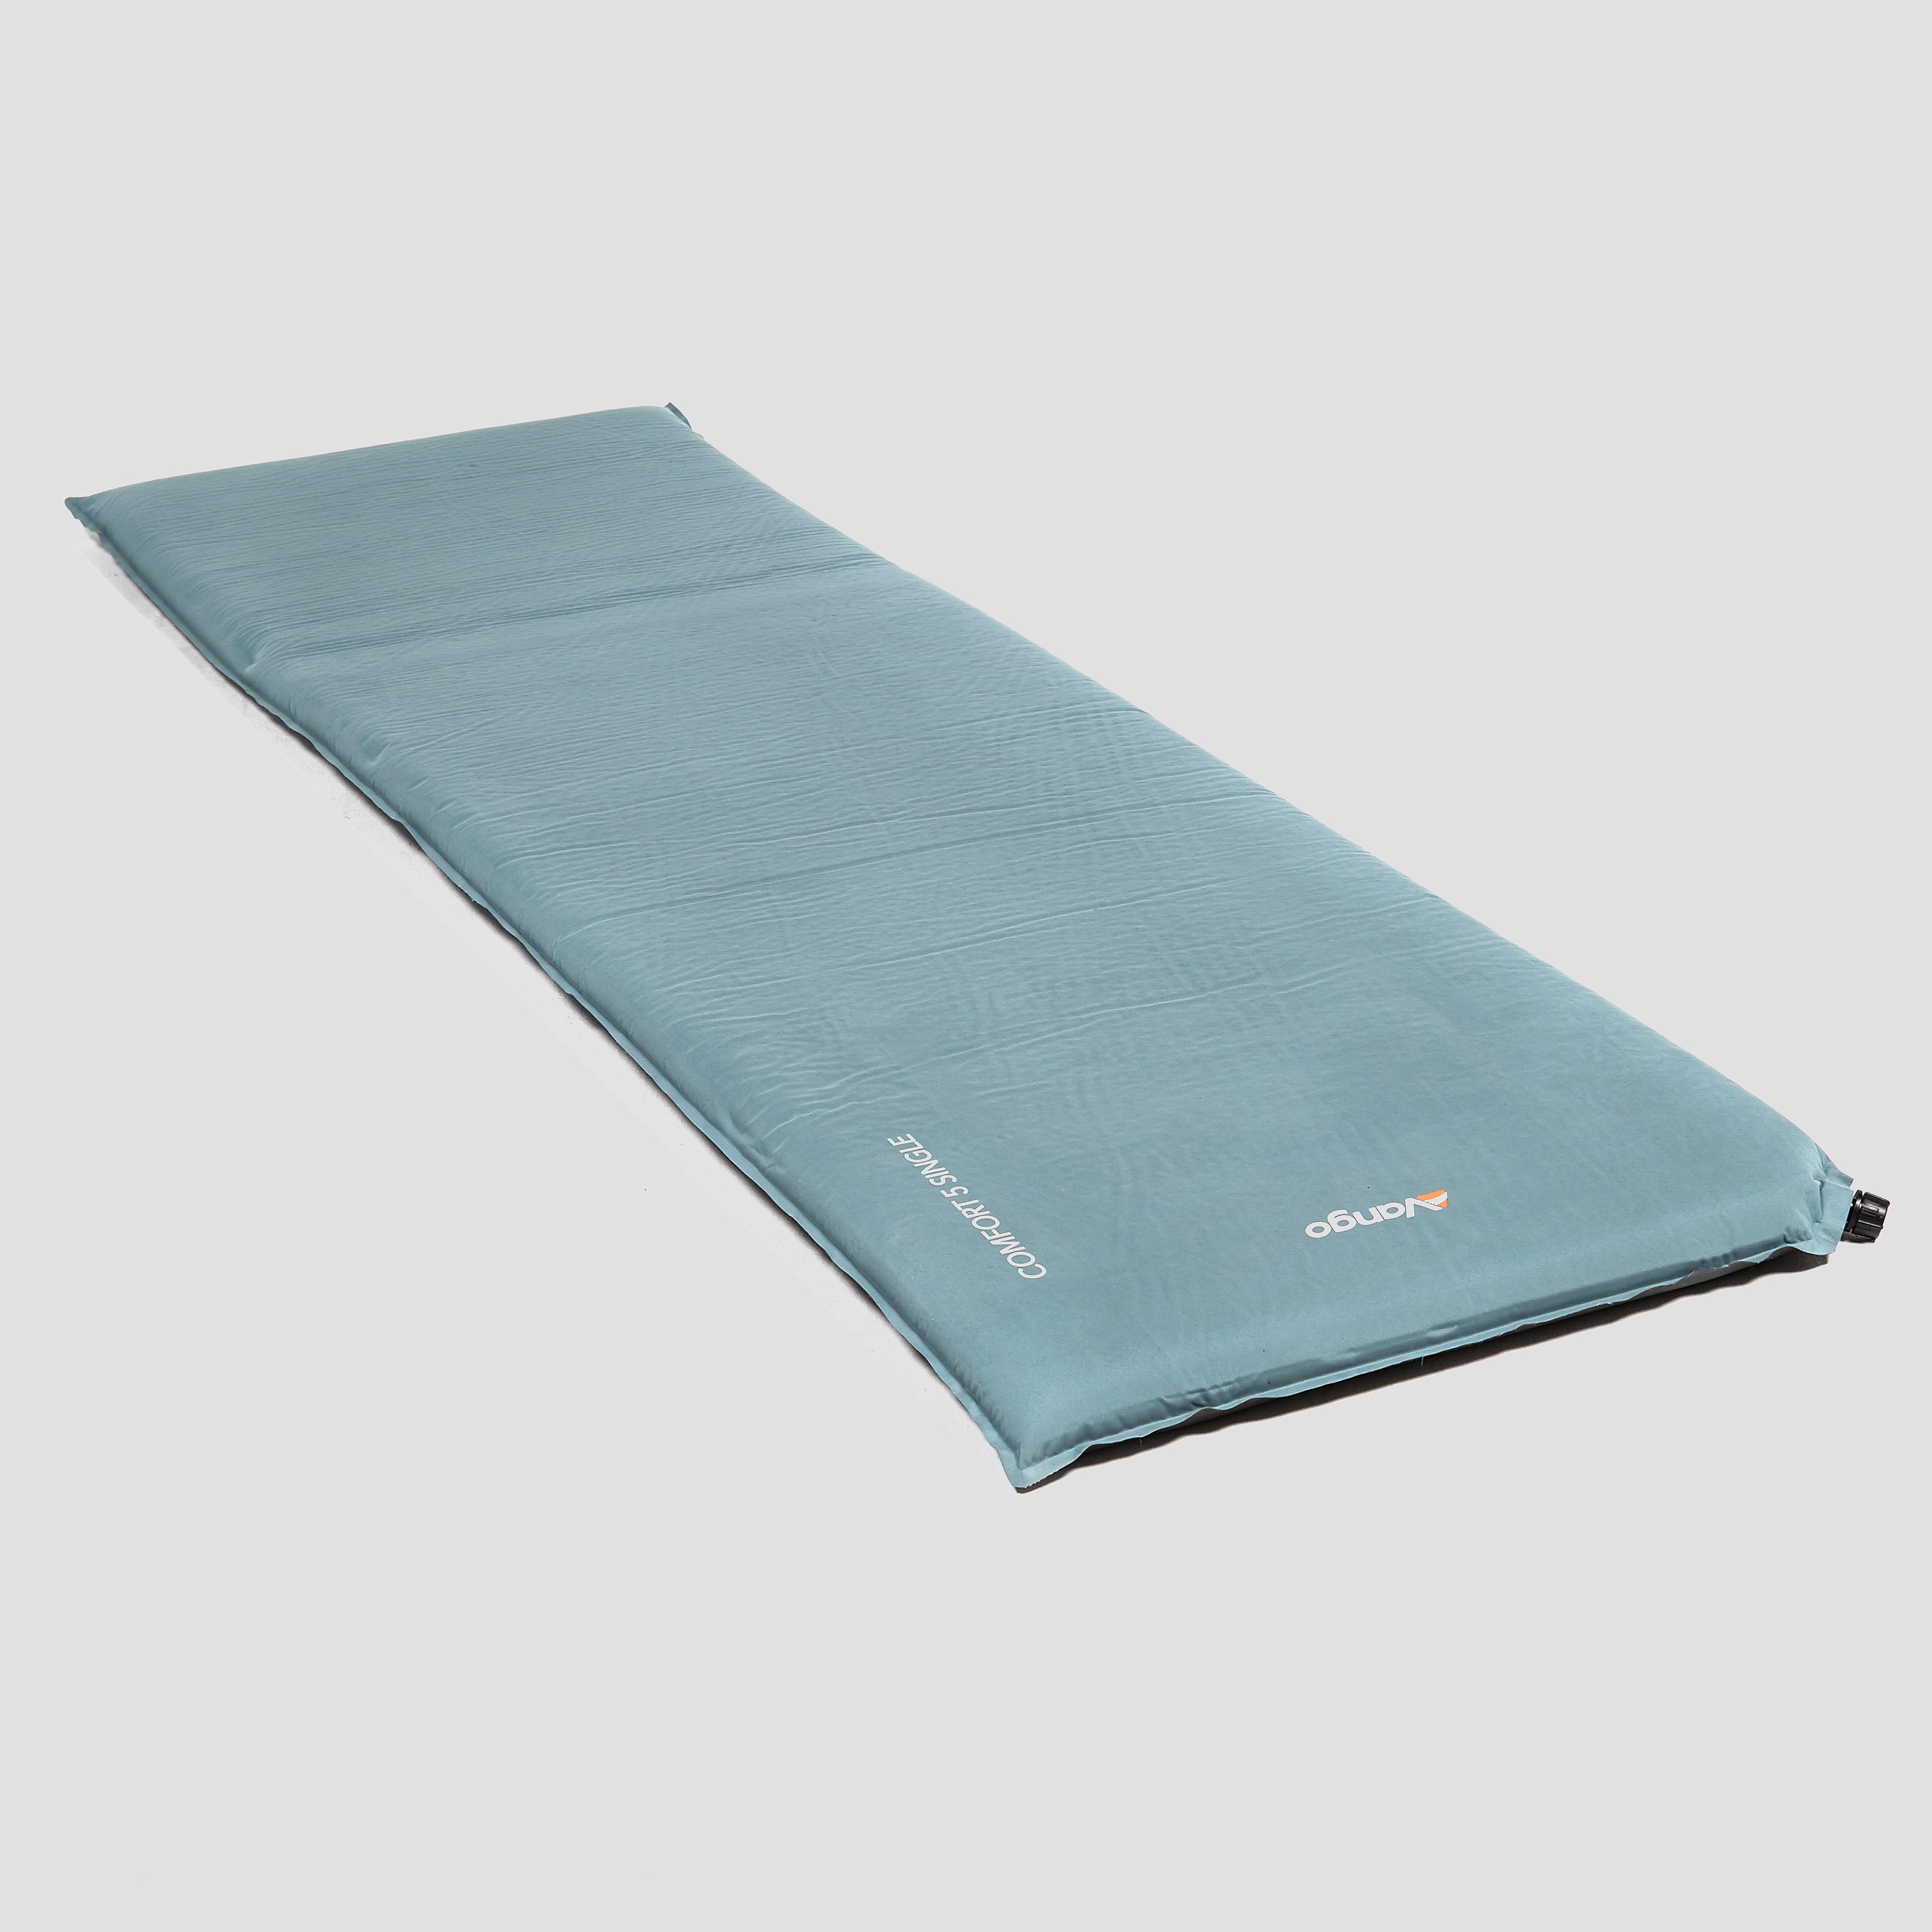 Vango Vango Comfort 5 Single Sleeping Mat